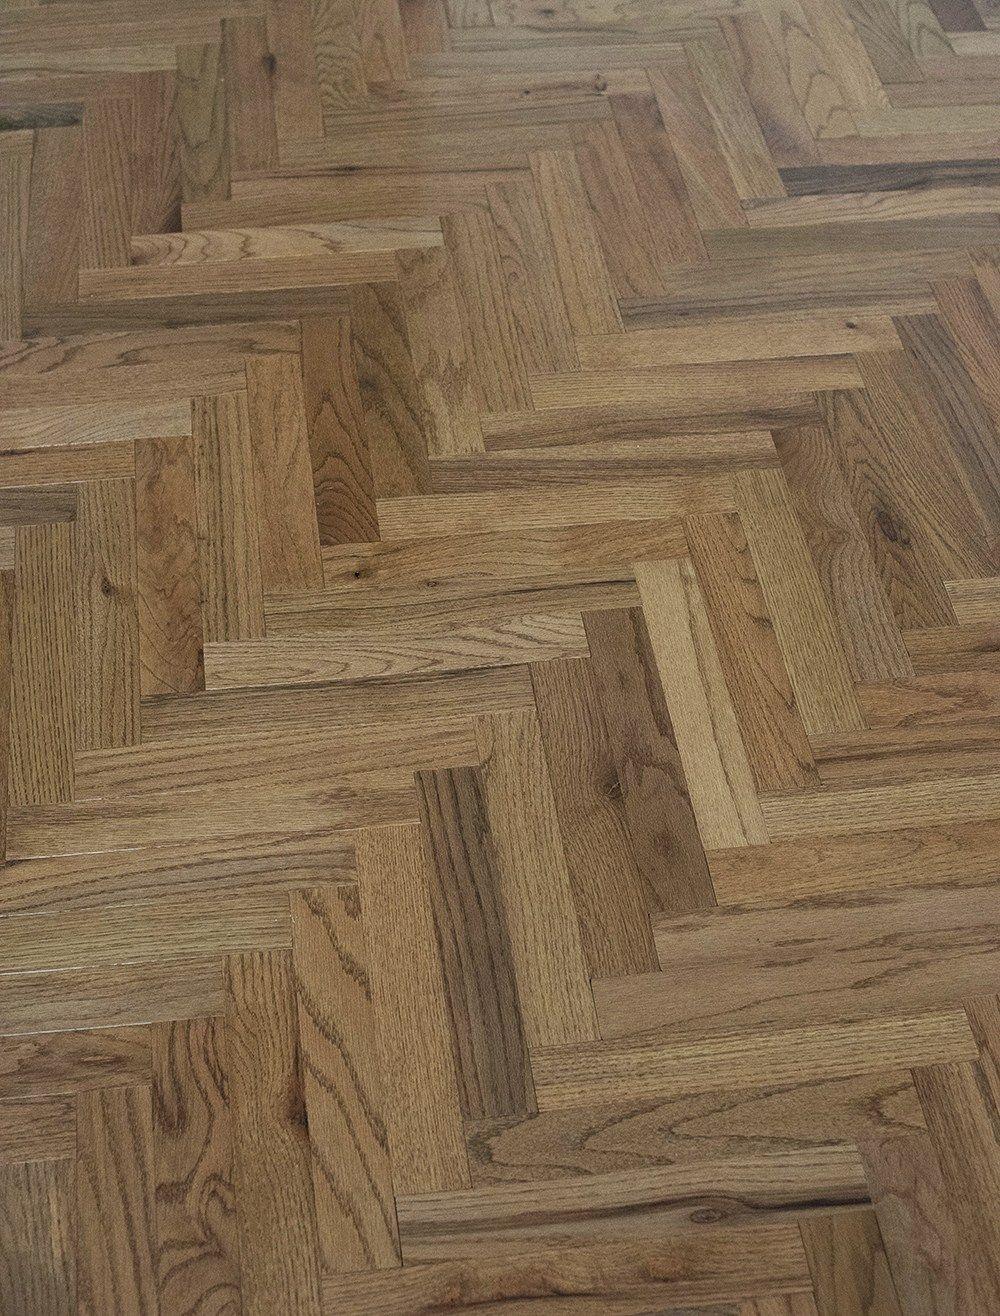 How To Install Herringbone Hardwood Flooring Hardwood Floors